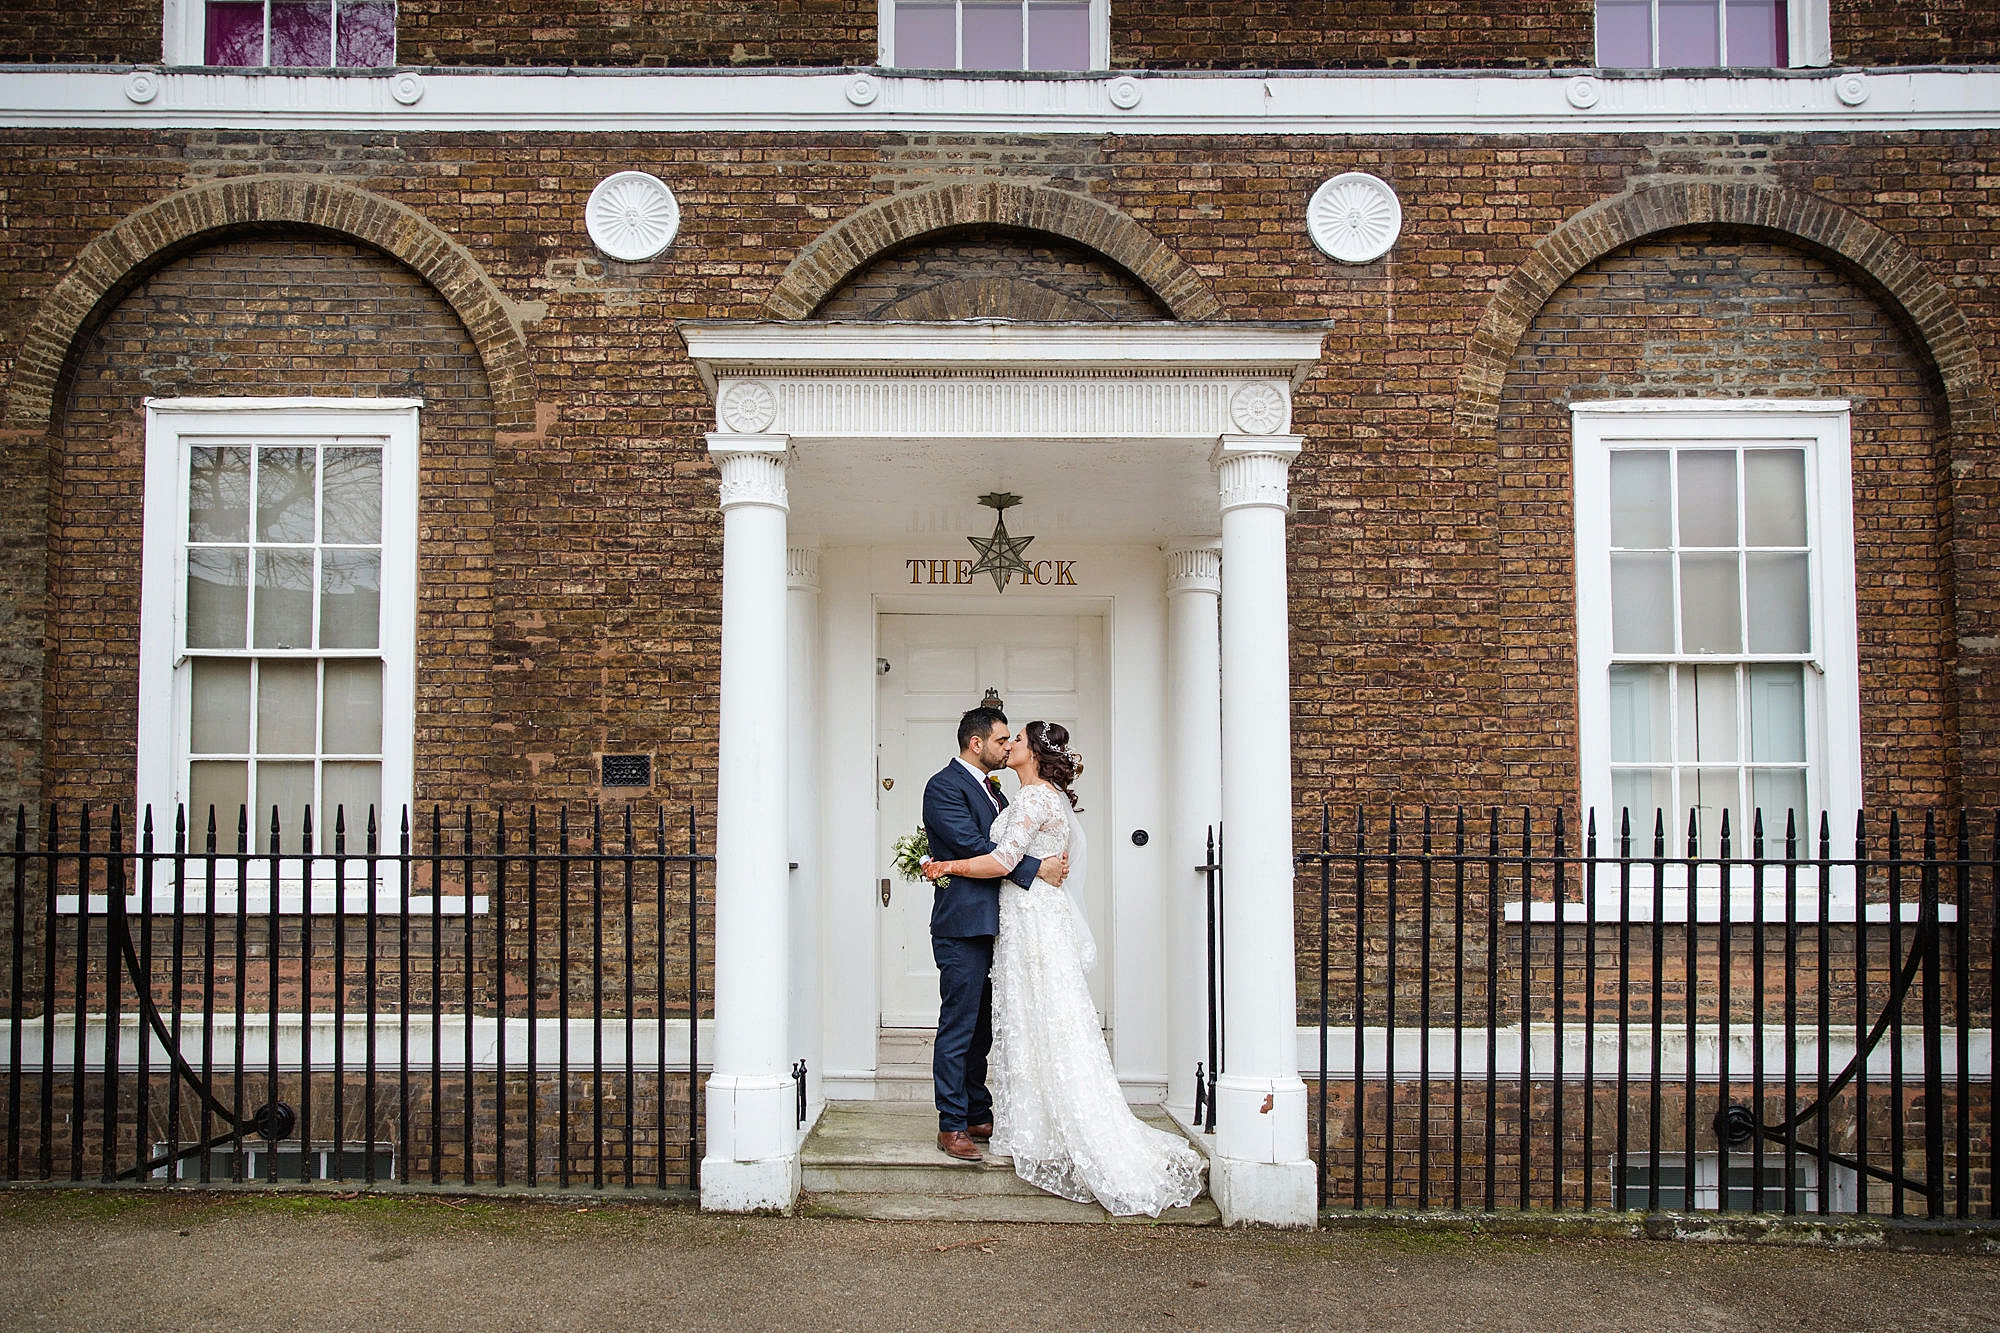 Richmond Hill Hotel wedding portrait of bride and groom in doorway